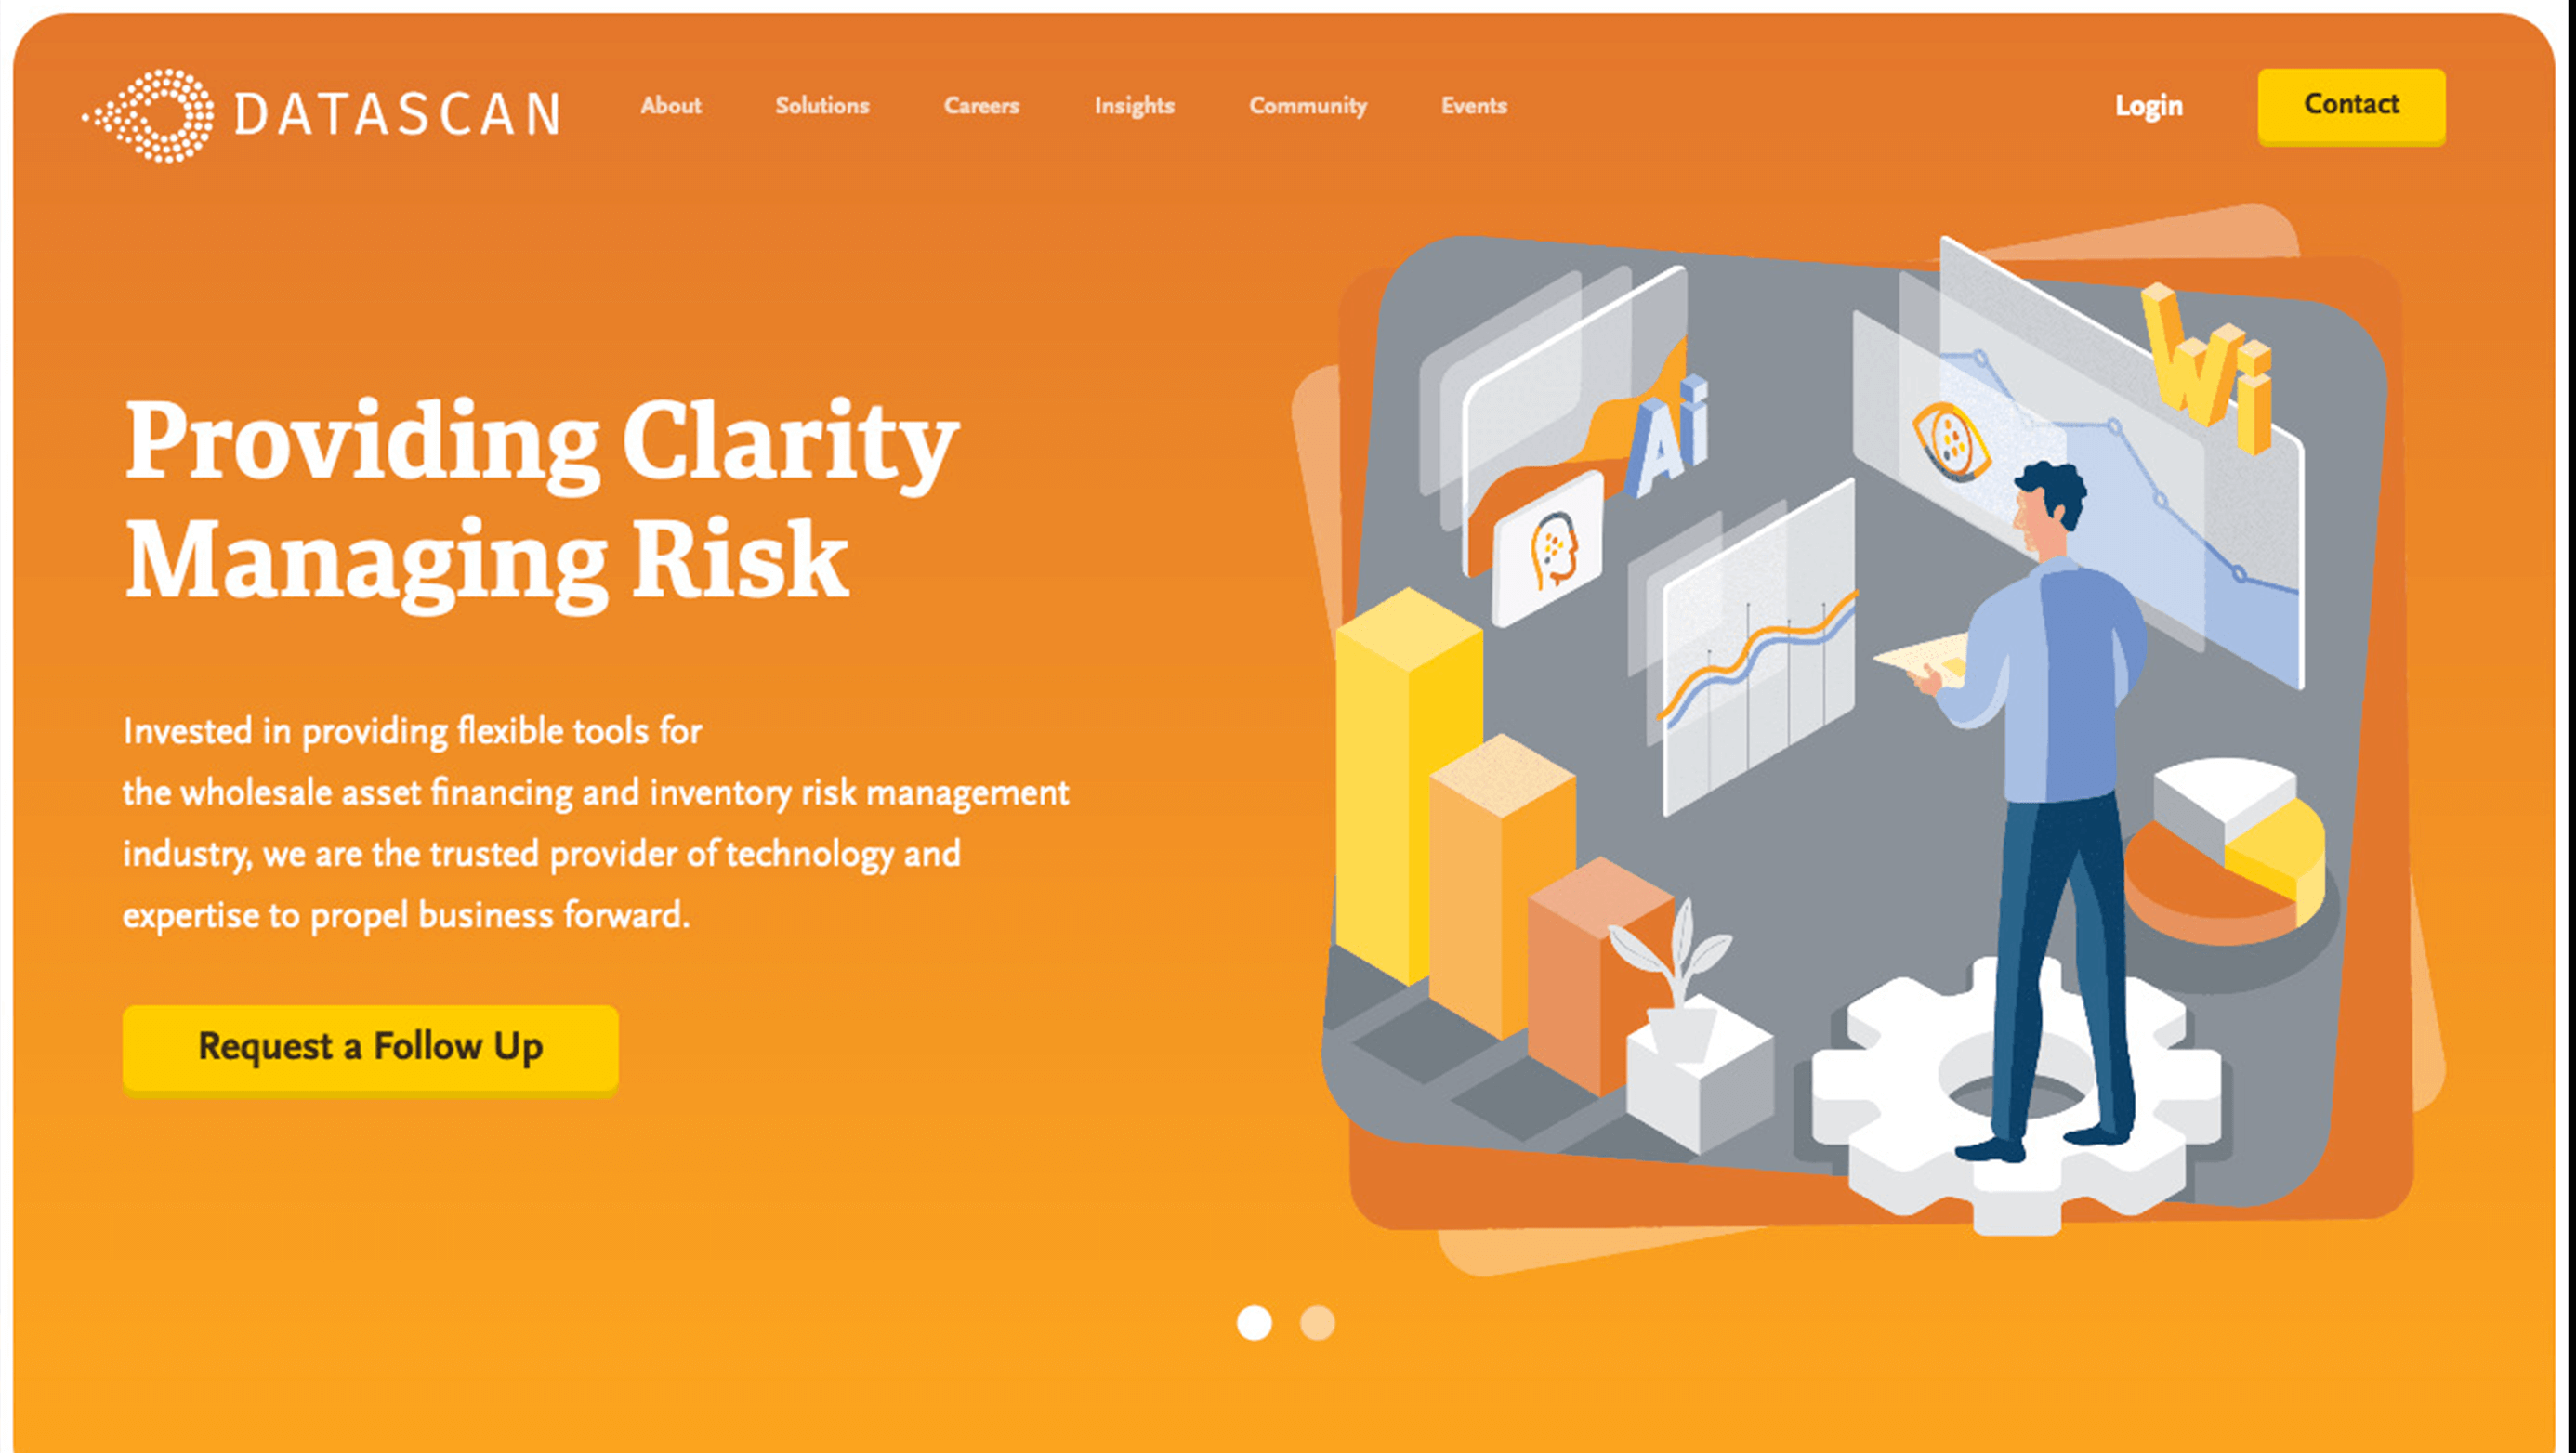 DataScan Company | The Creative Momentum - Web Design & Digital Marketing